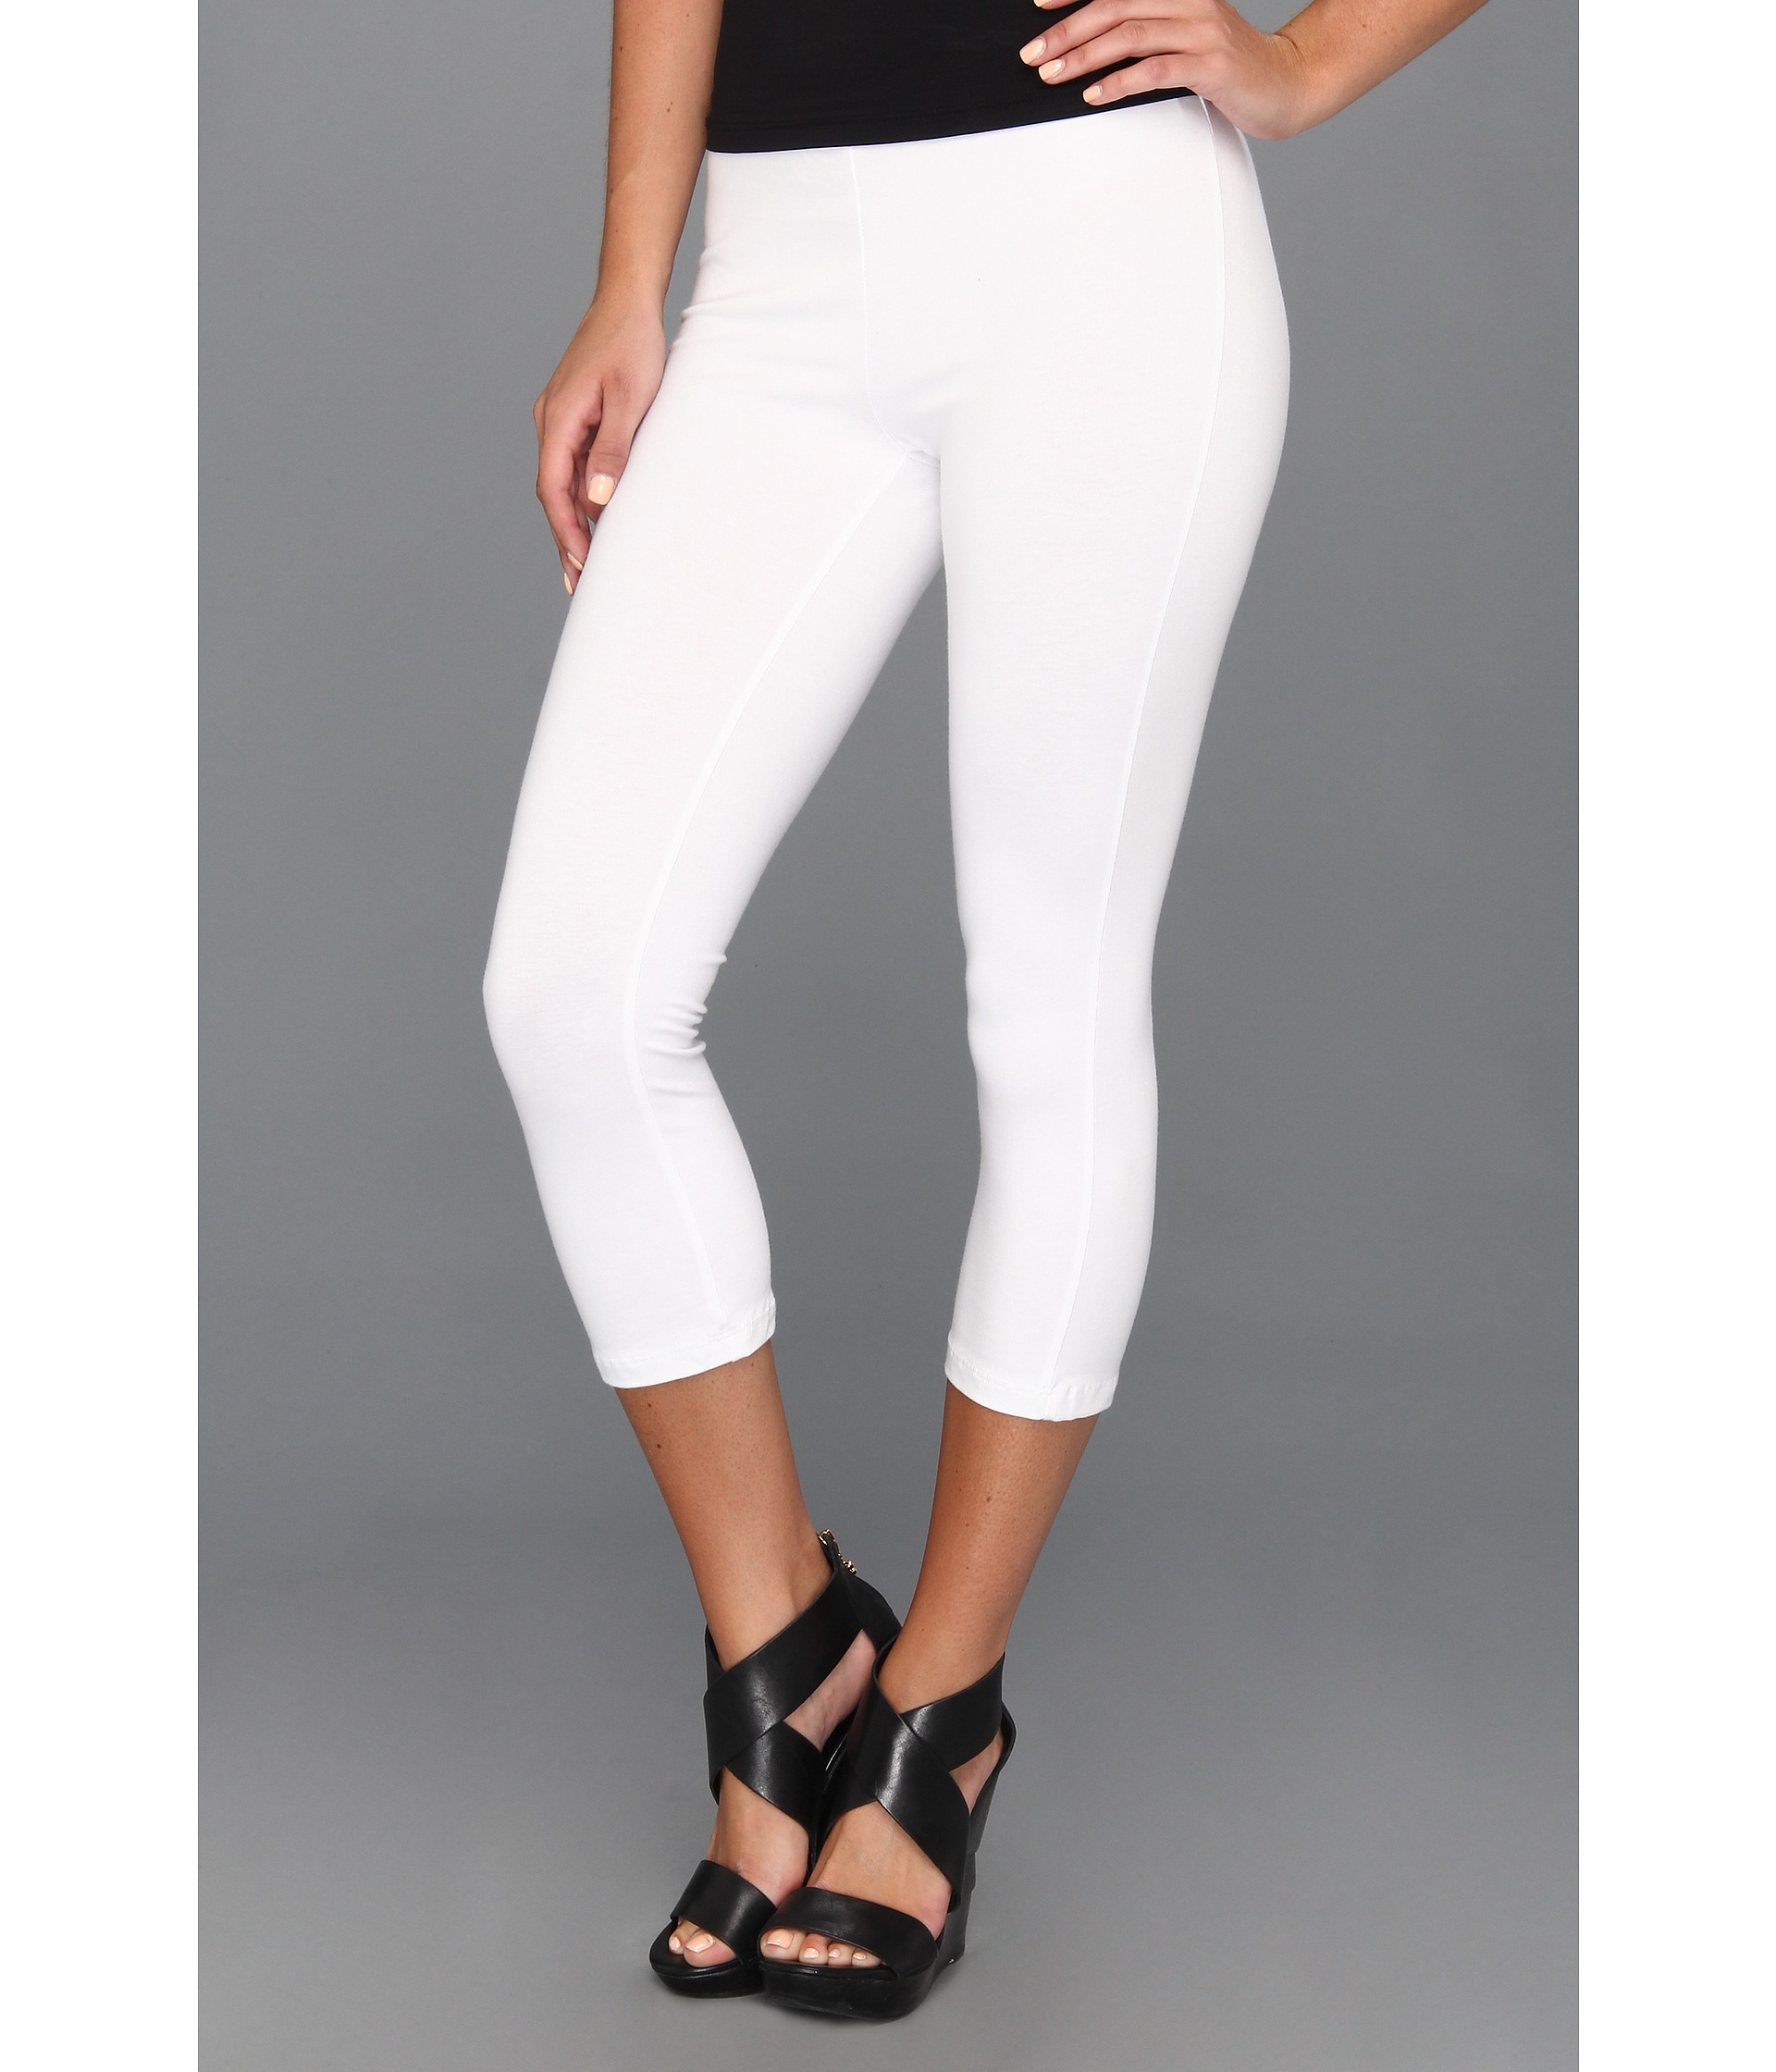 White Cotton Capri Leggings - The Else